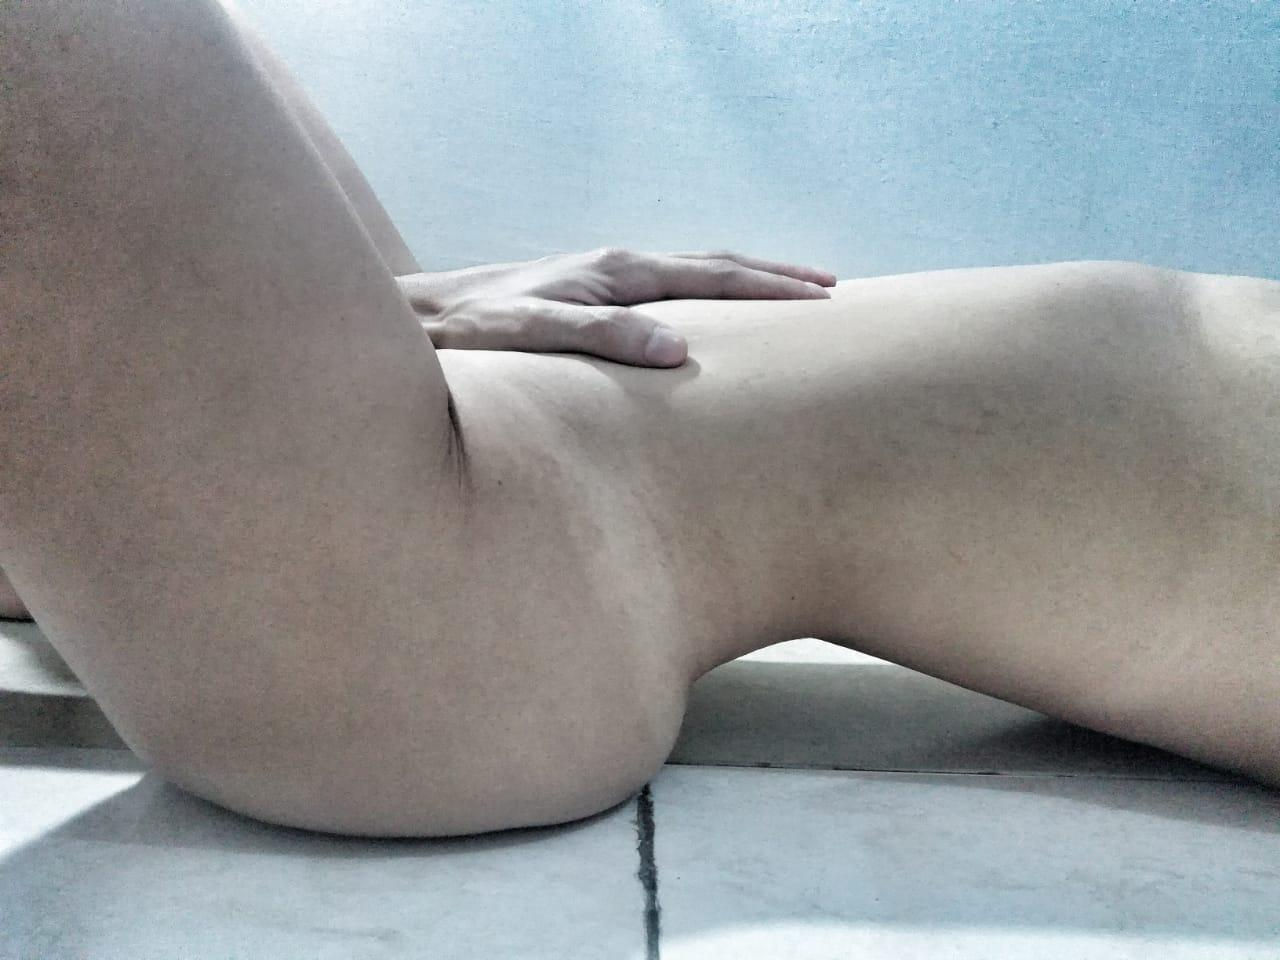 Sex horny?s=23zyu3h6nn4isendye7j7ngd8wzczbf+7abal9mro3g=